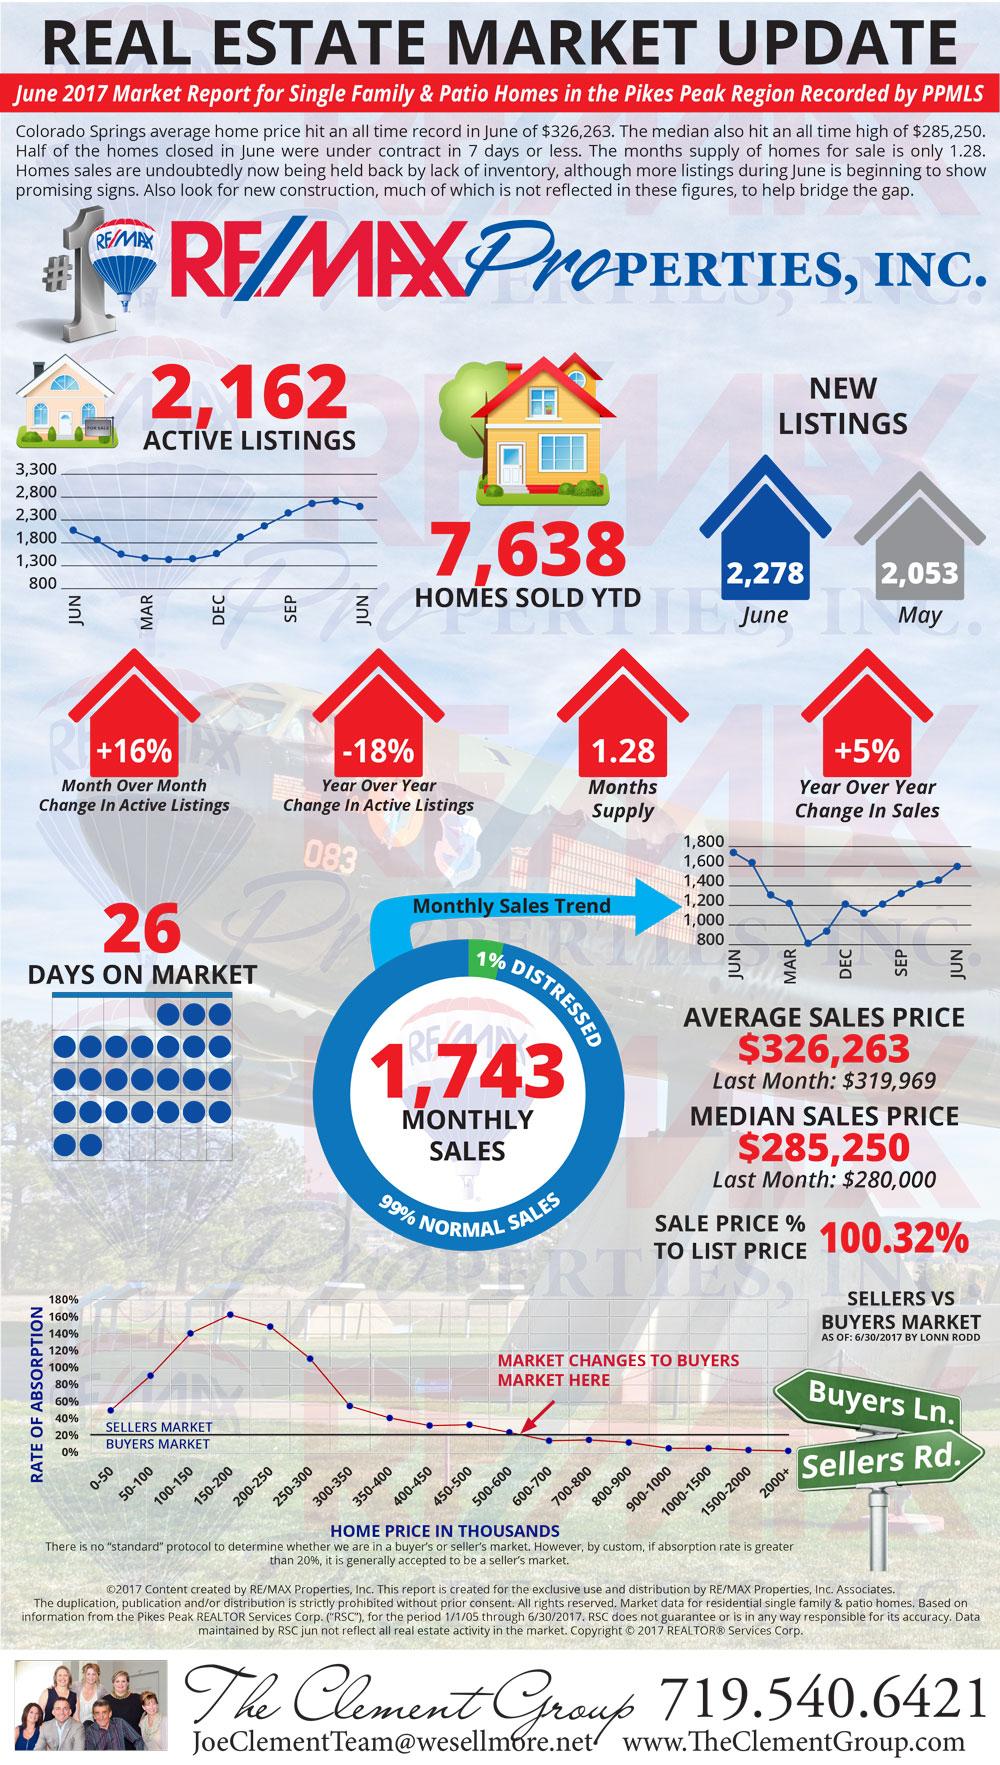 June 2017 Market Update - Colorado Springs Real Estate